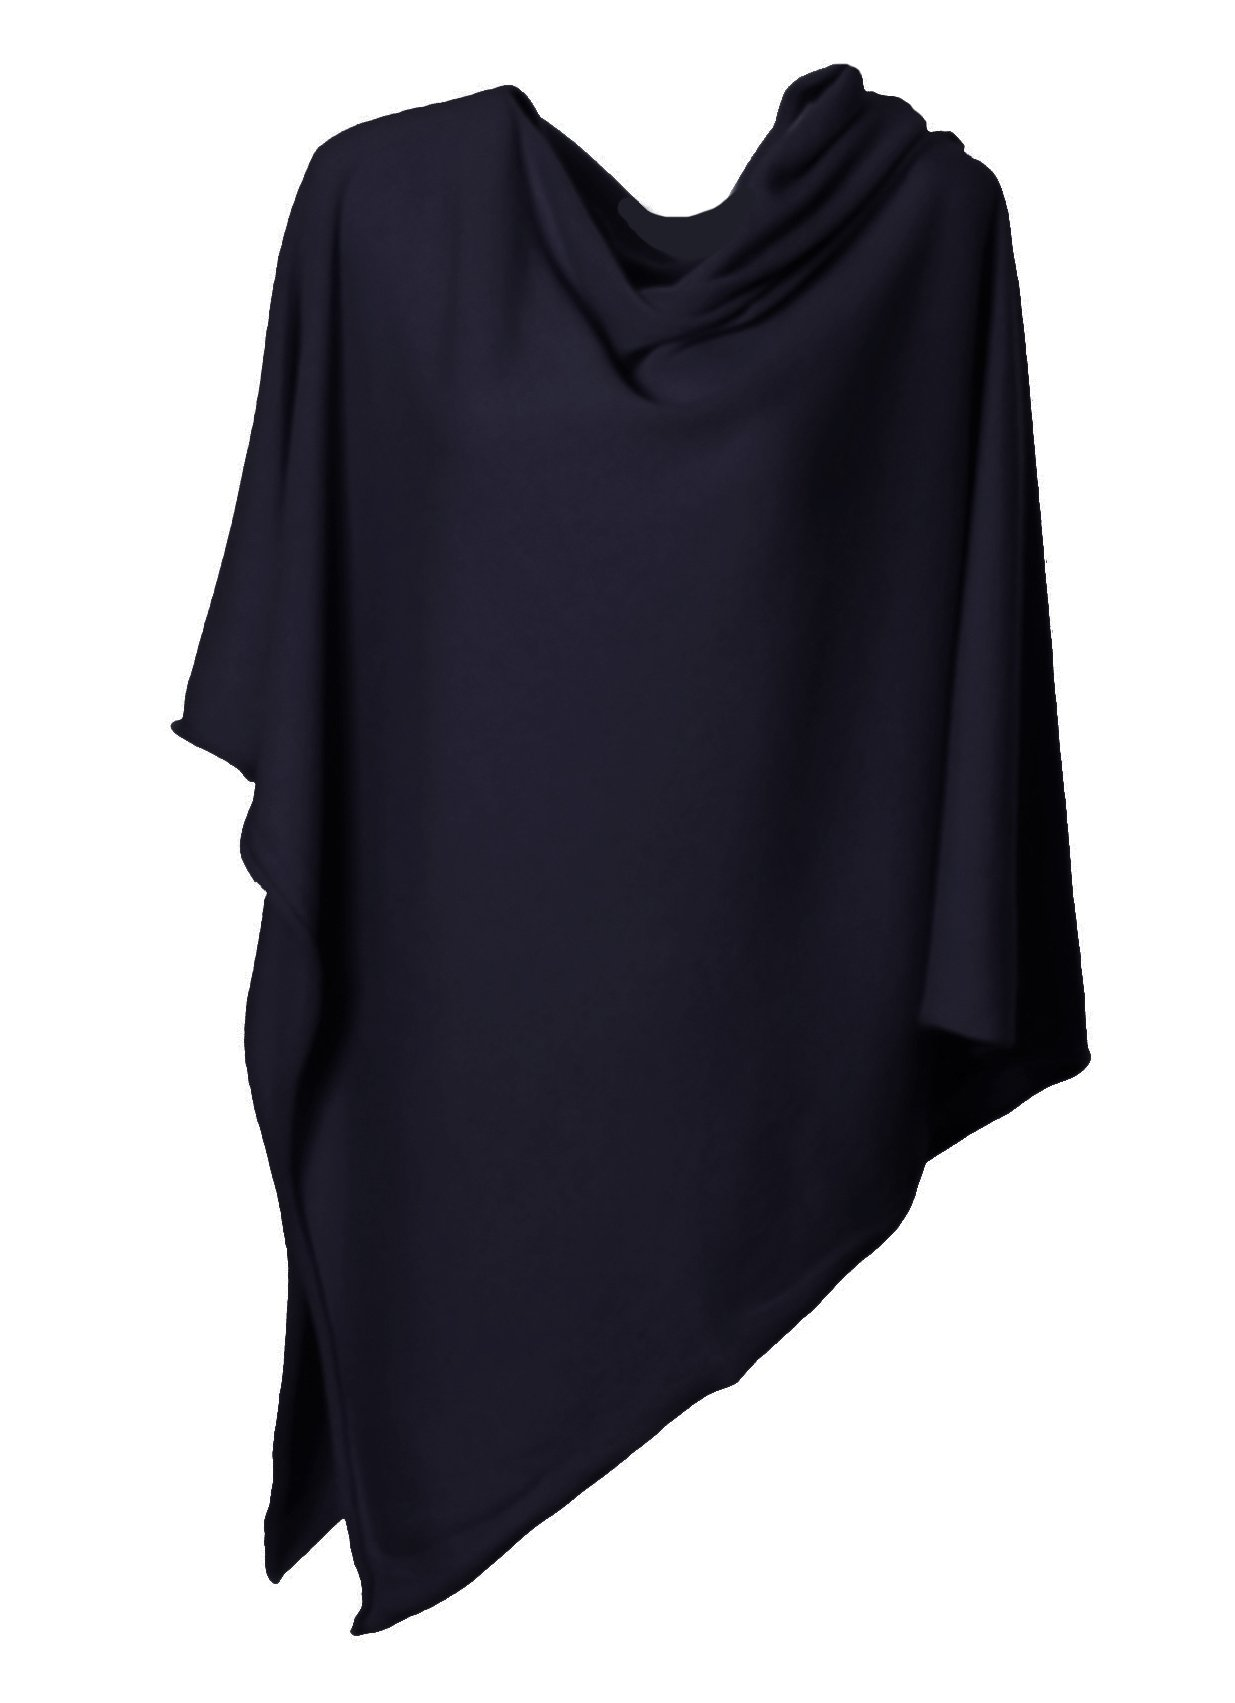 Anna Kristine Asymmetrical 100% Cashmere Draped Poncho Topper - Navy Blue